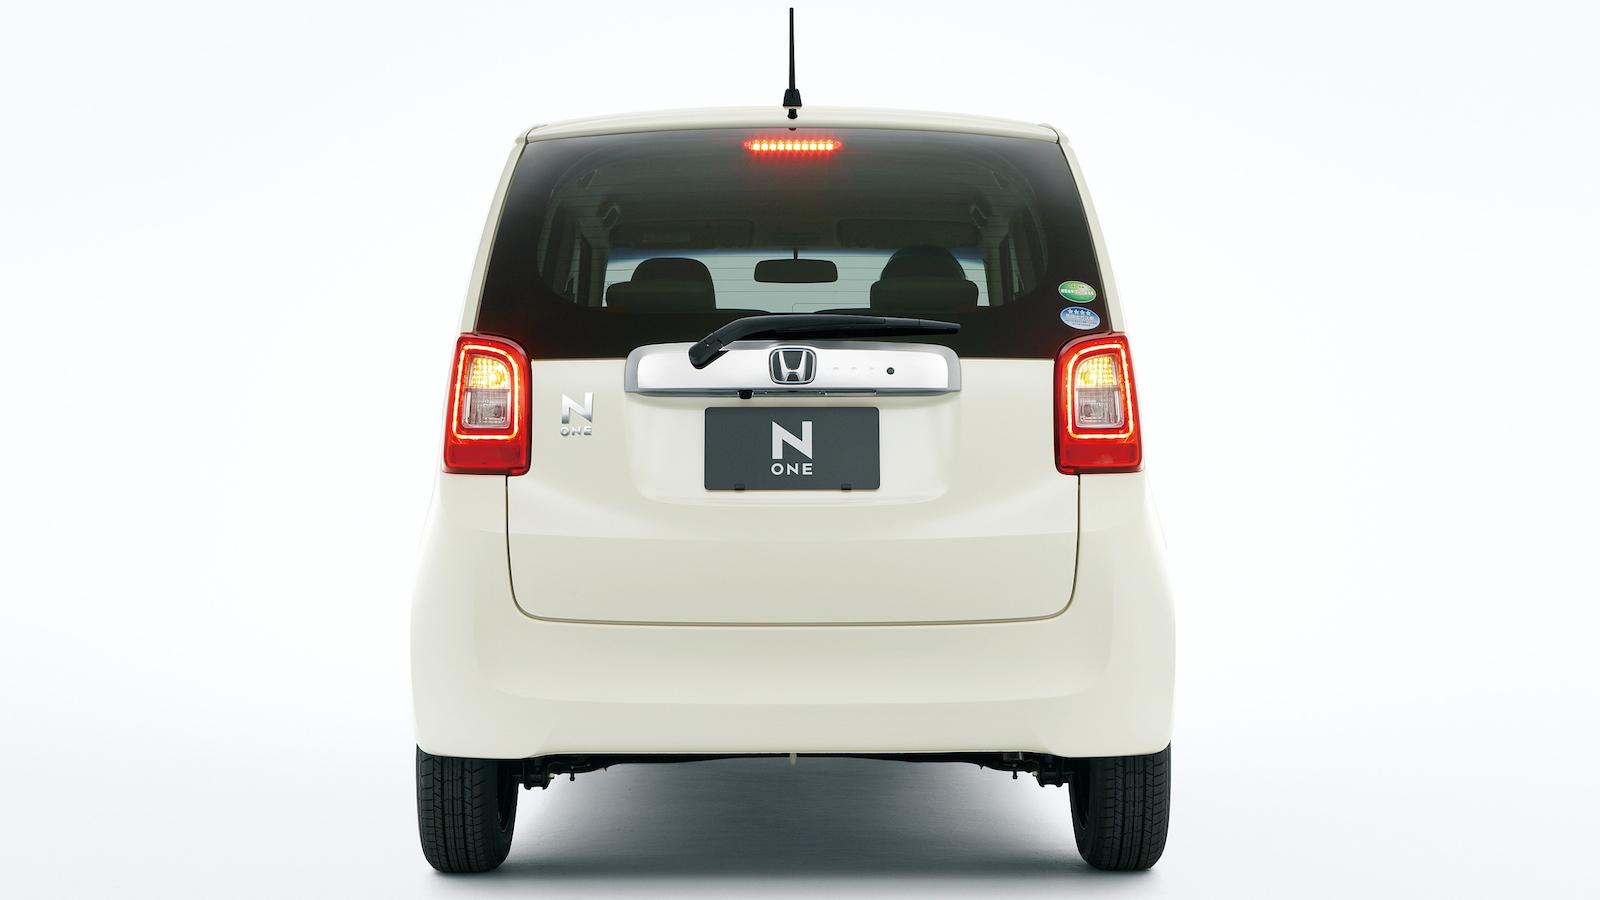 Honda's N-One retro minicar - image: Honda Motor Co